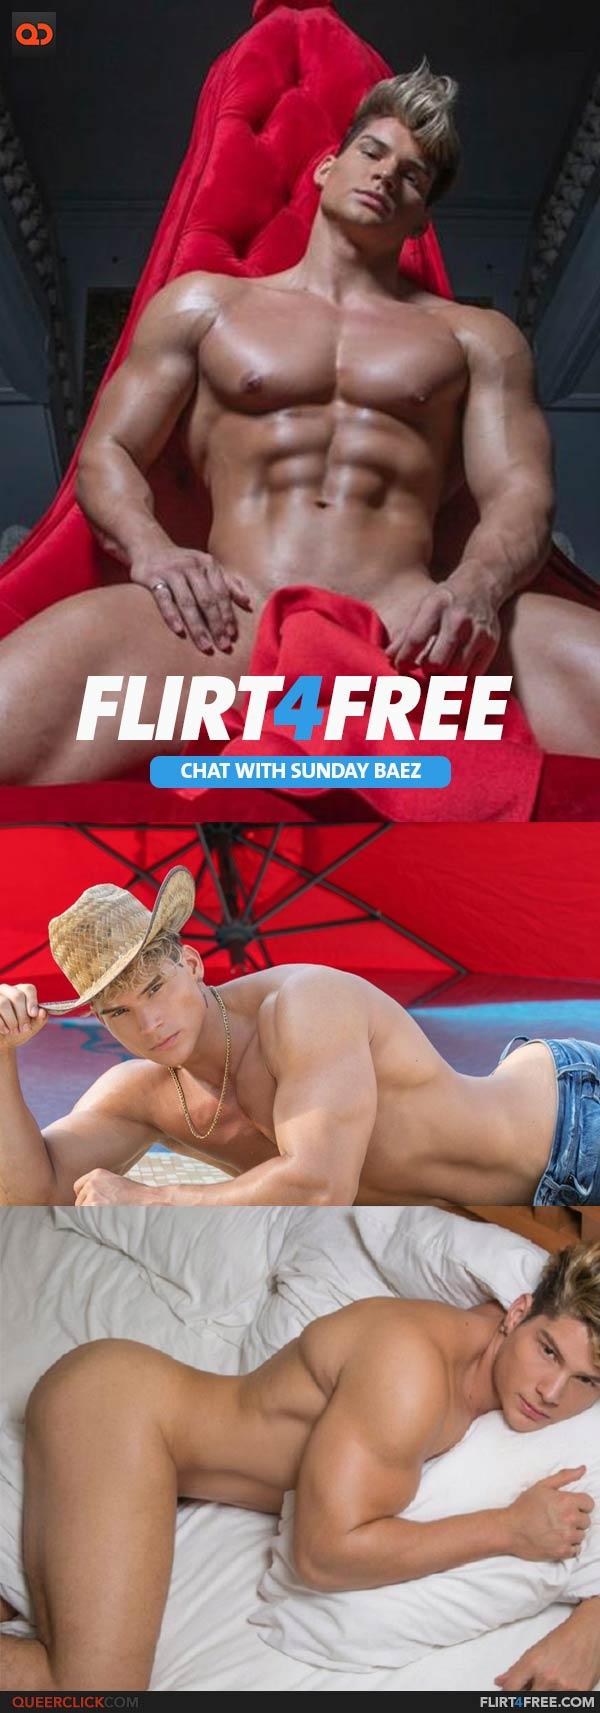 Flirt4Free: Sunday Baez